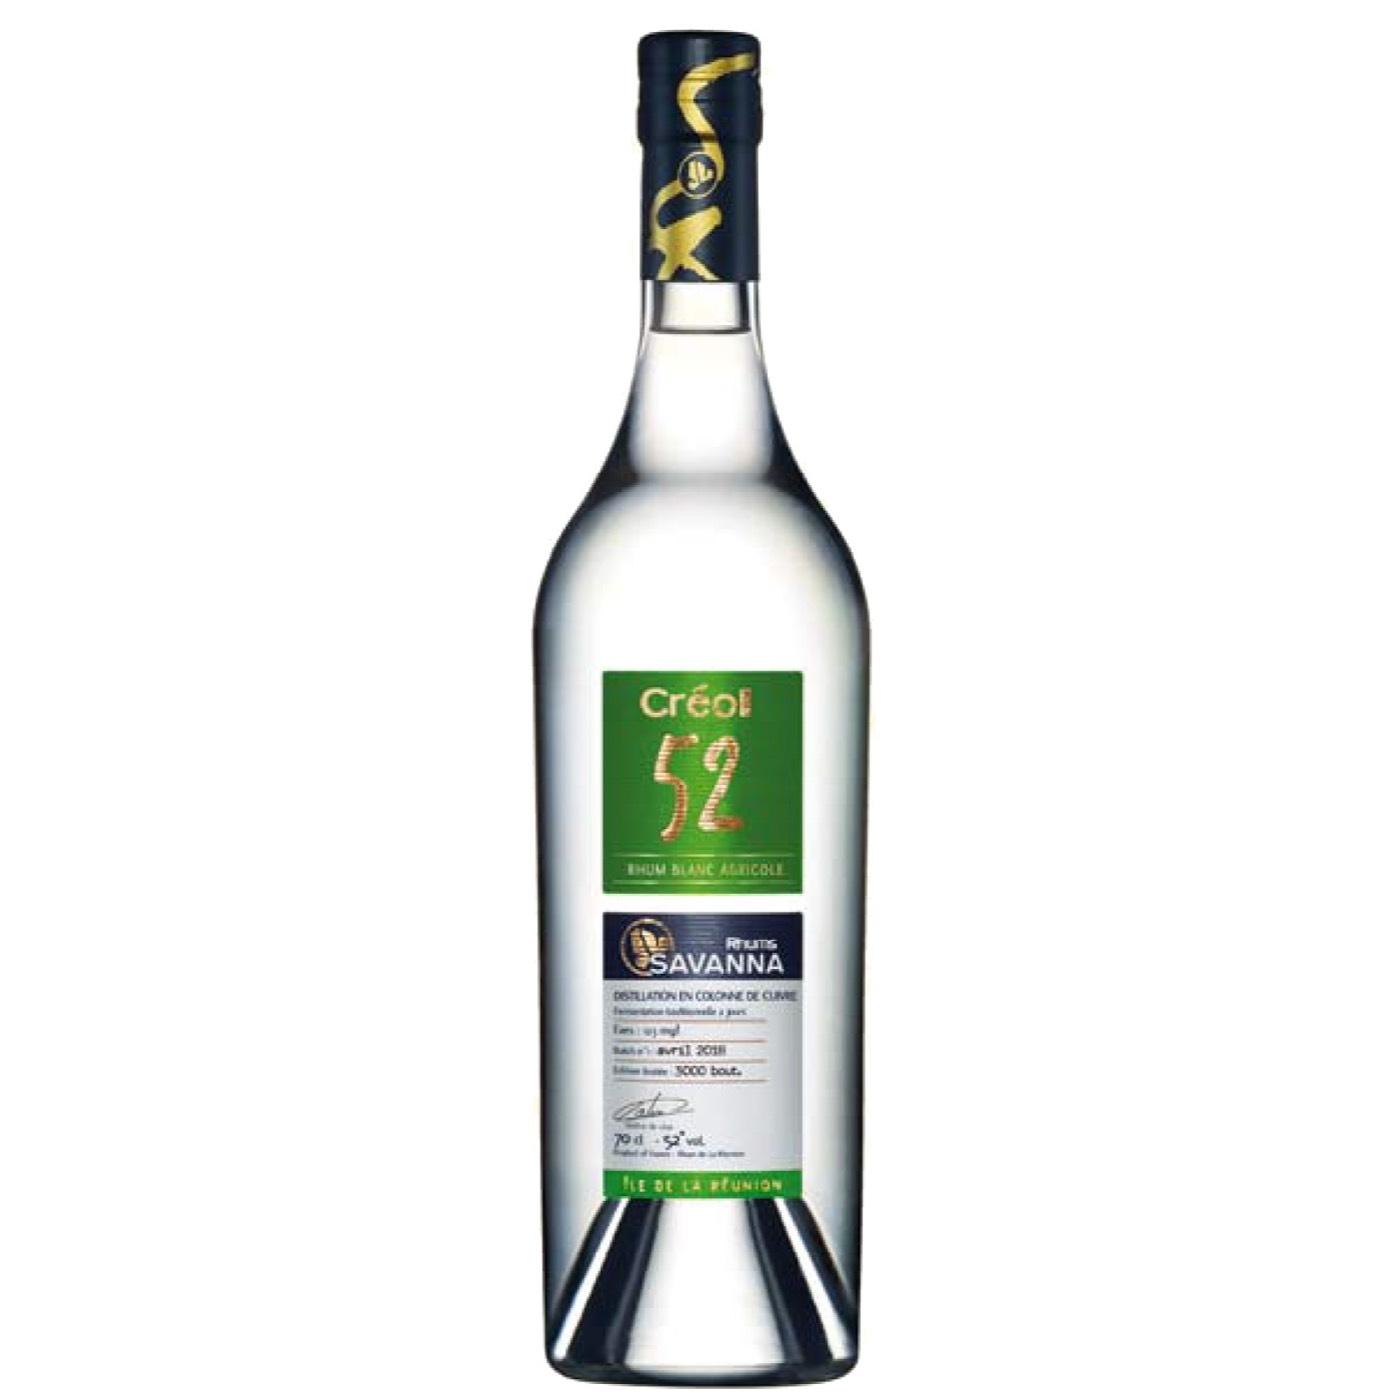 Bottle image of Créol 52